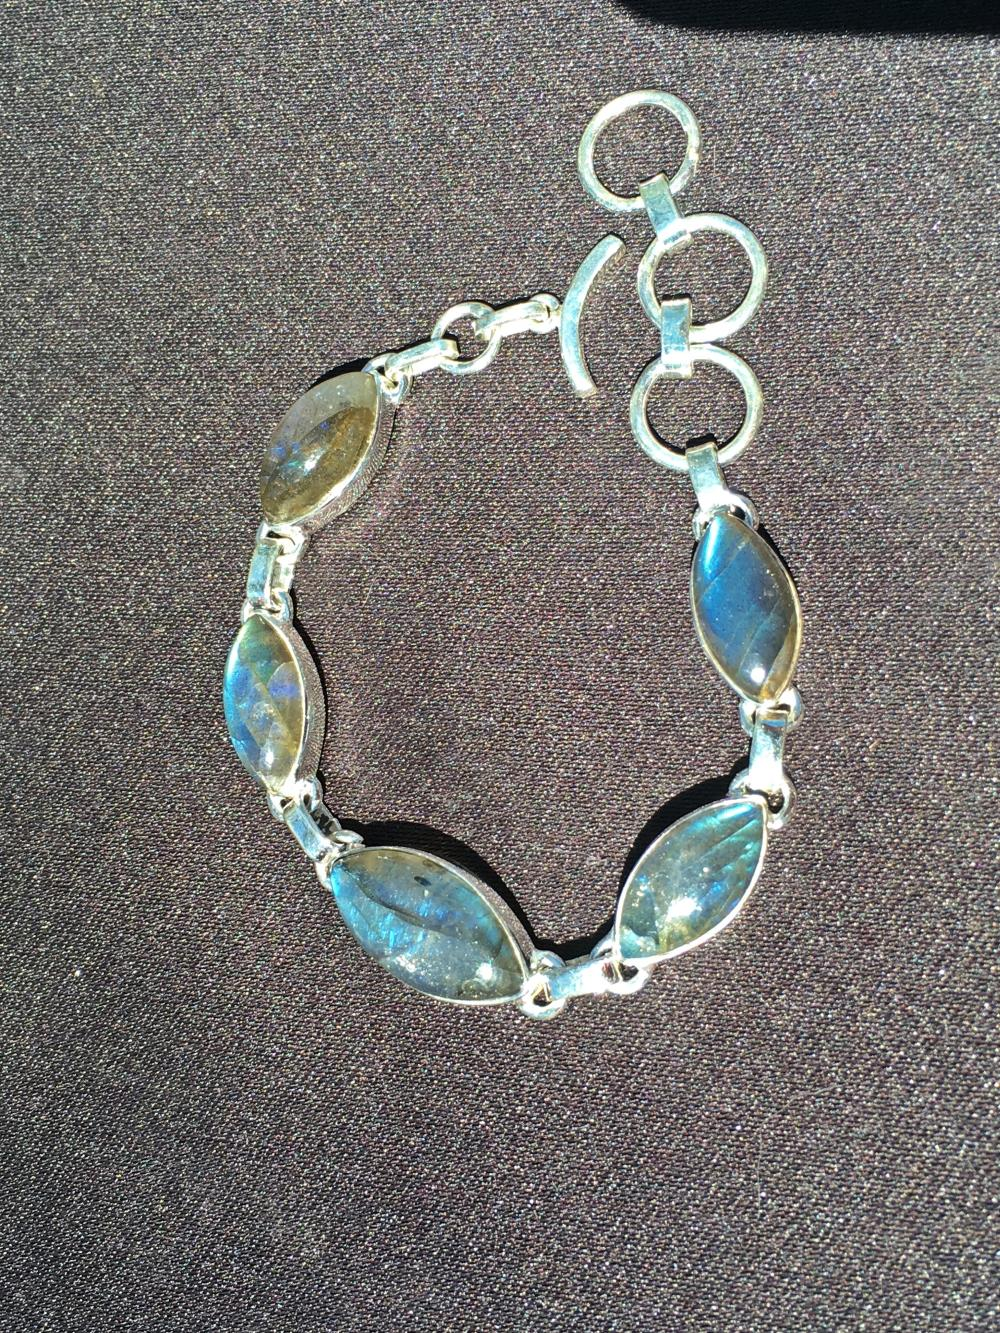 Labradorite, Rock, Crystal, Natural, Jewelry, Sterling